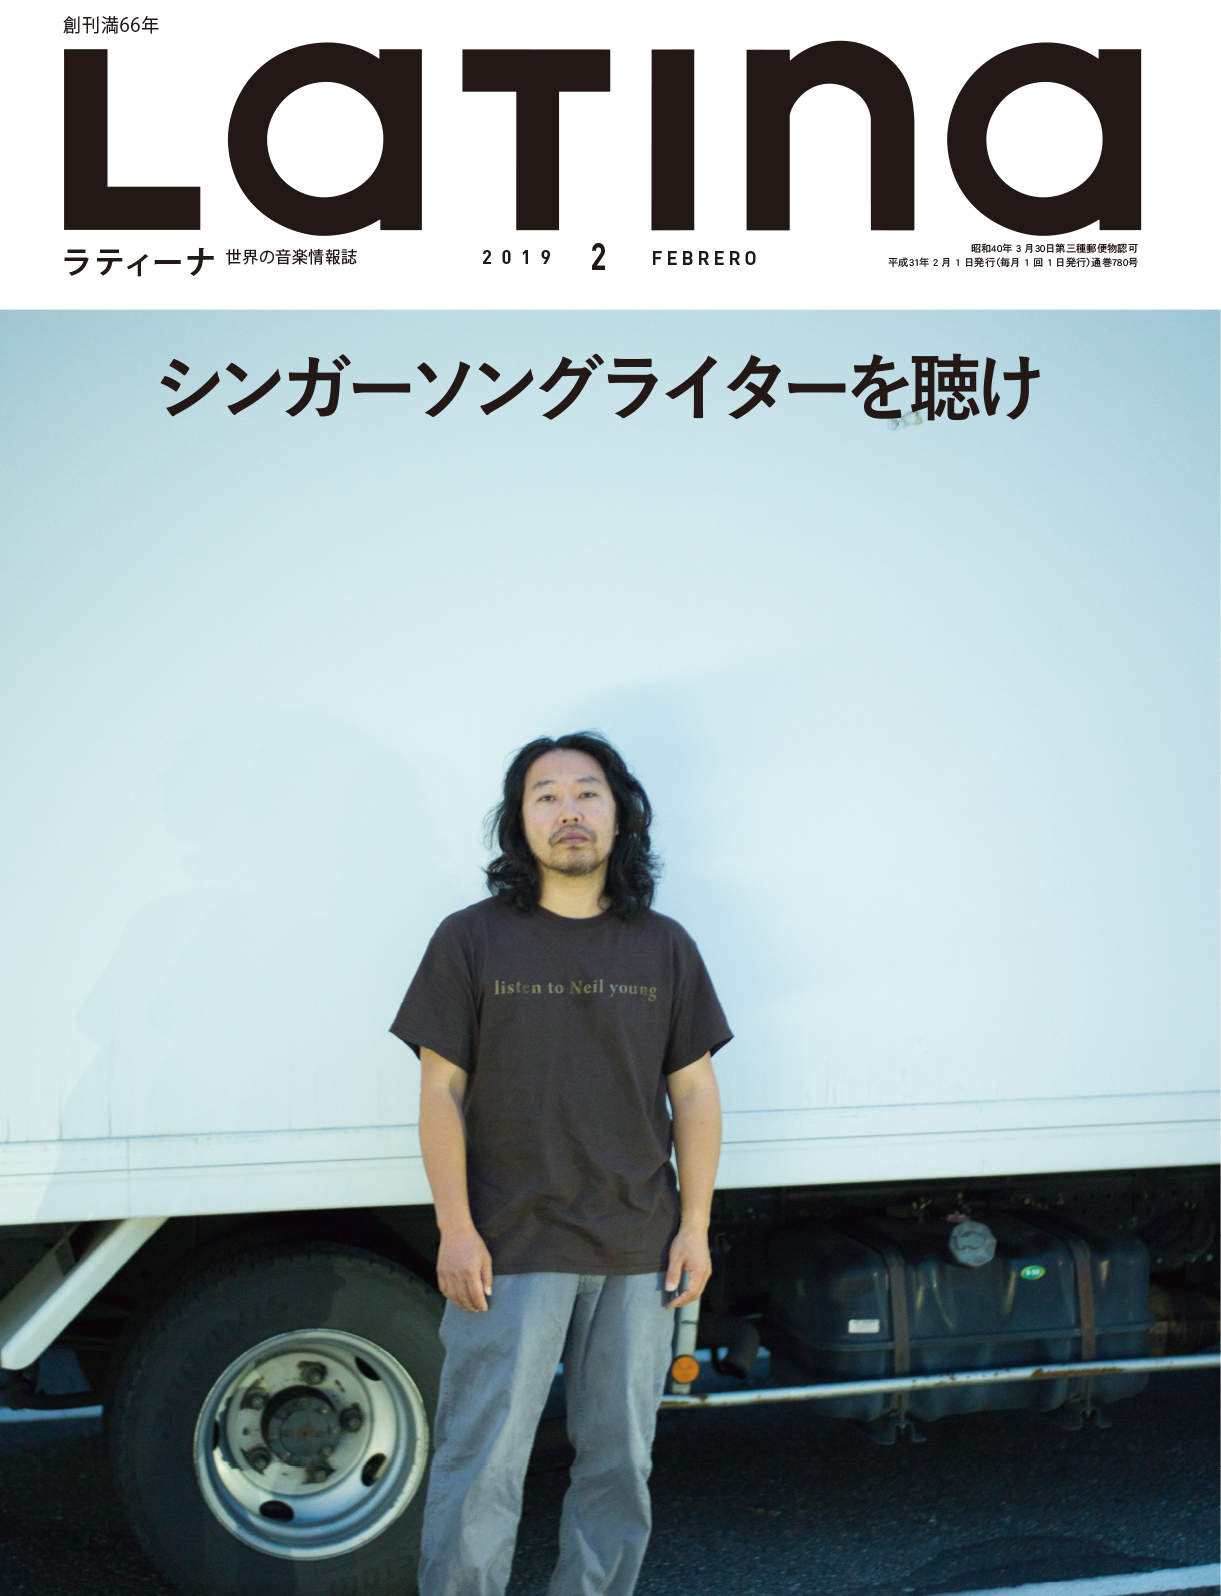 http://rose-records.jp/files/20190124180000.jpg